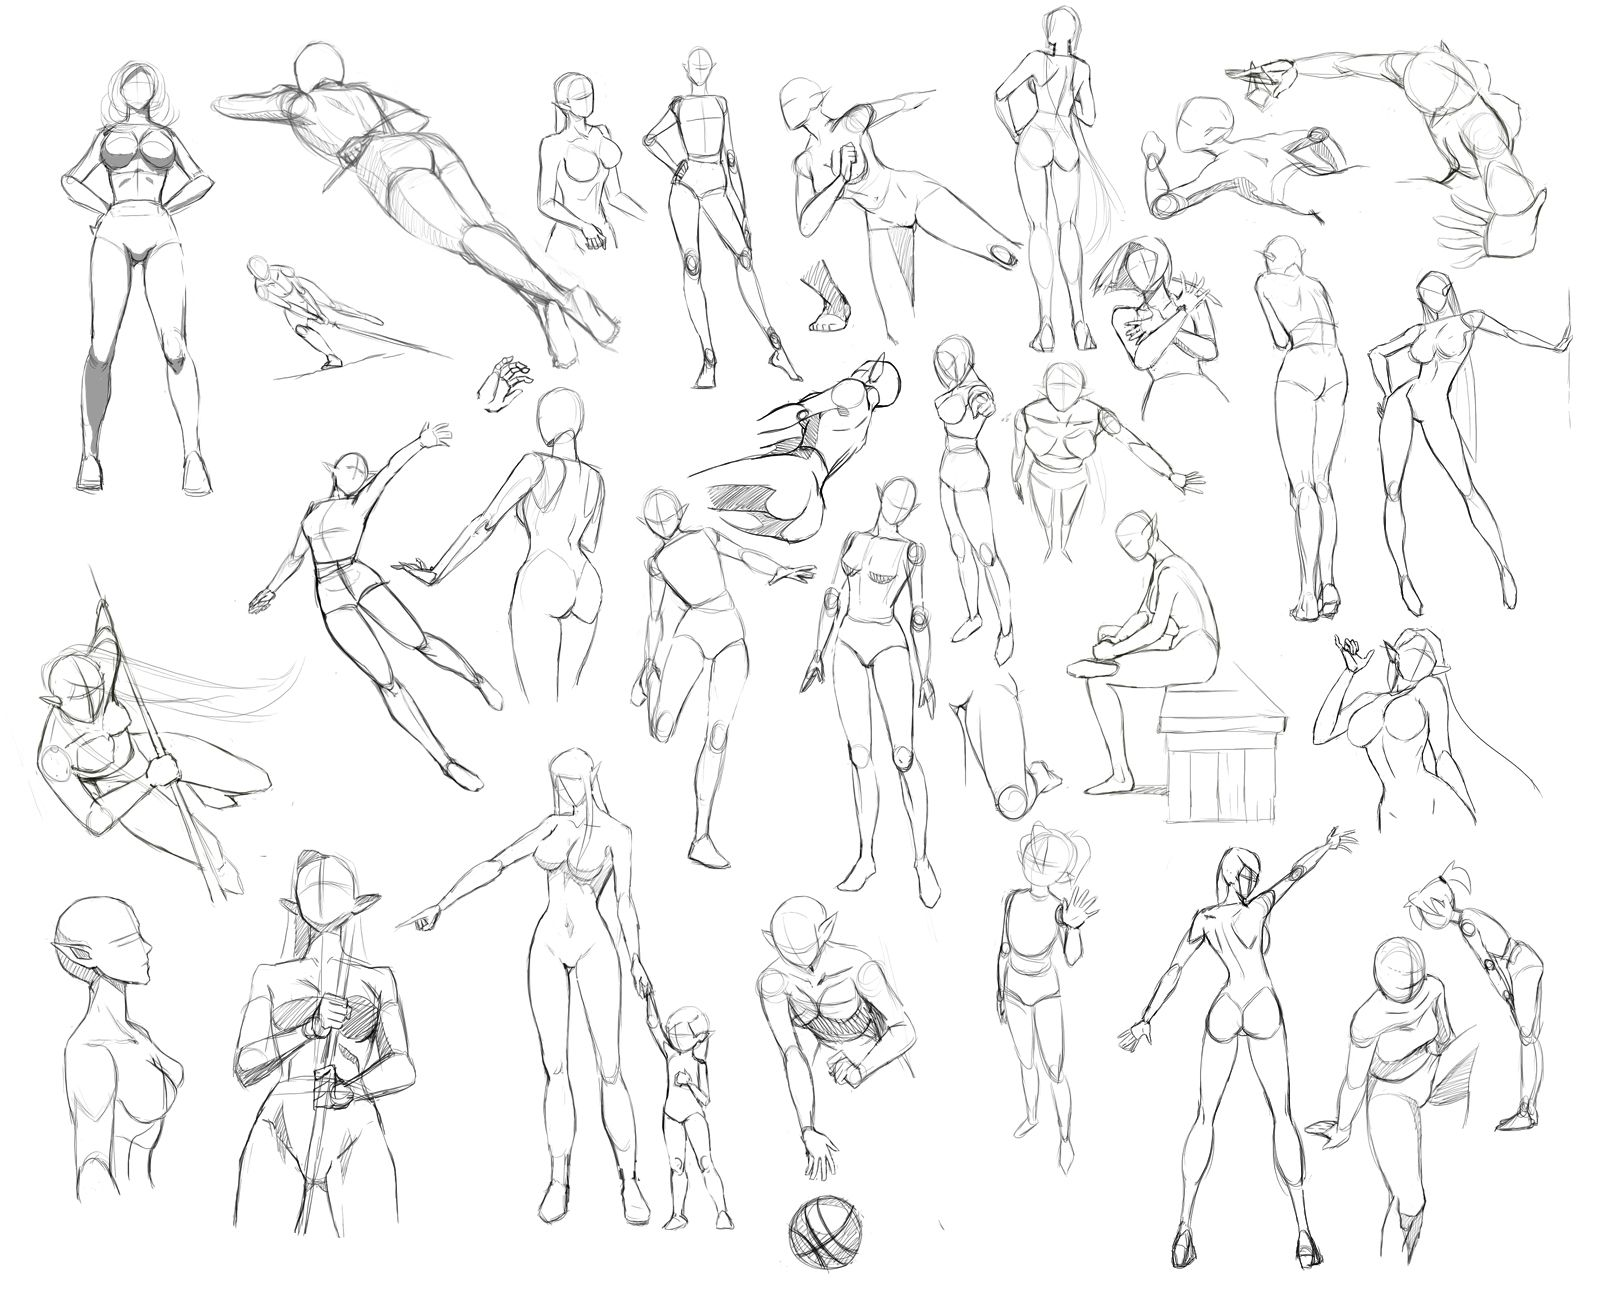 Female Anatomy By Preciatiantart On @deviantart